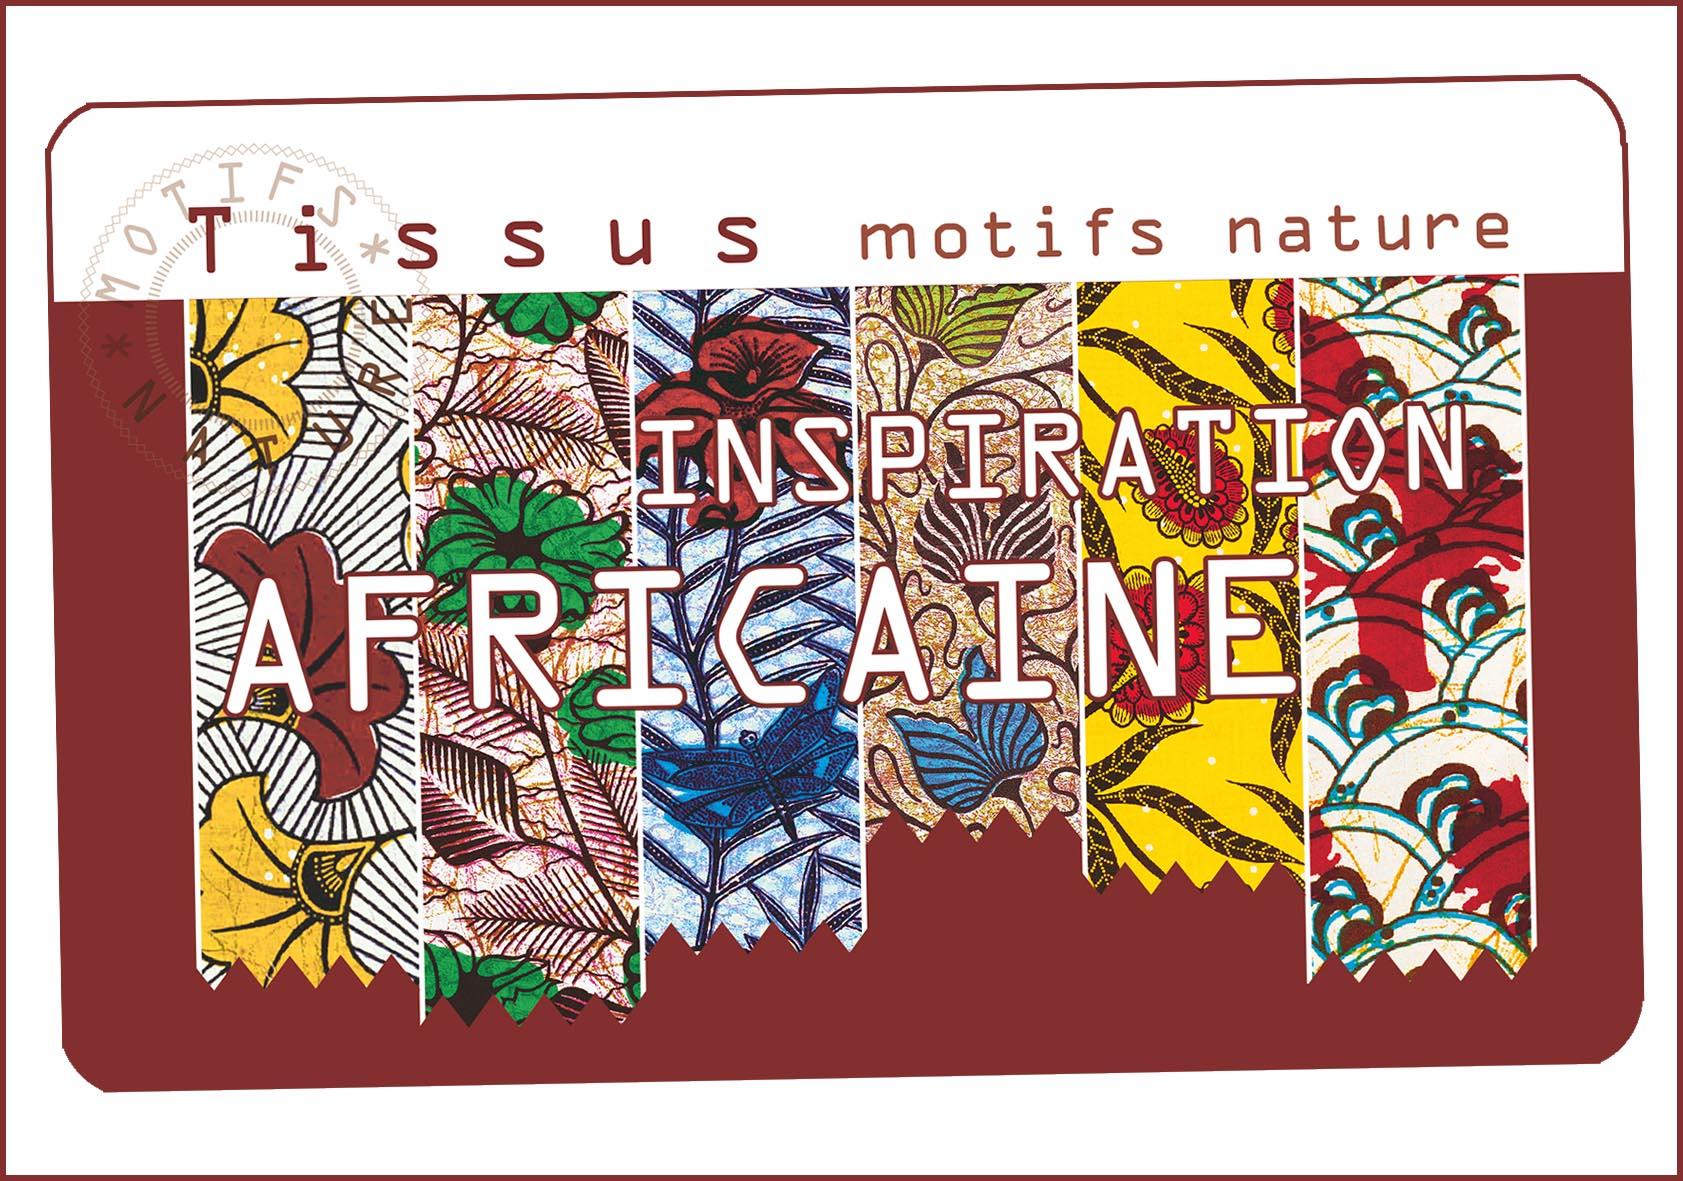 Carnet Tissus motifs nature INSPIRATION AFRICAINE